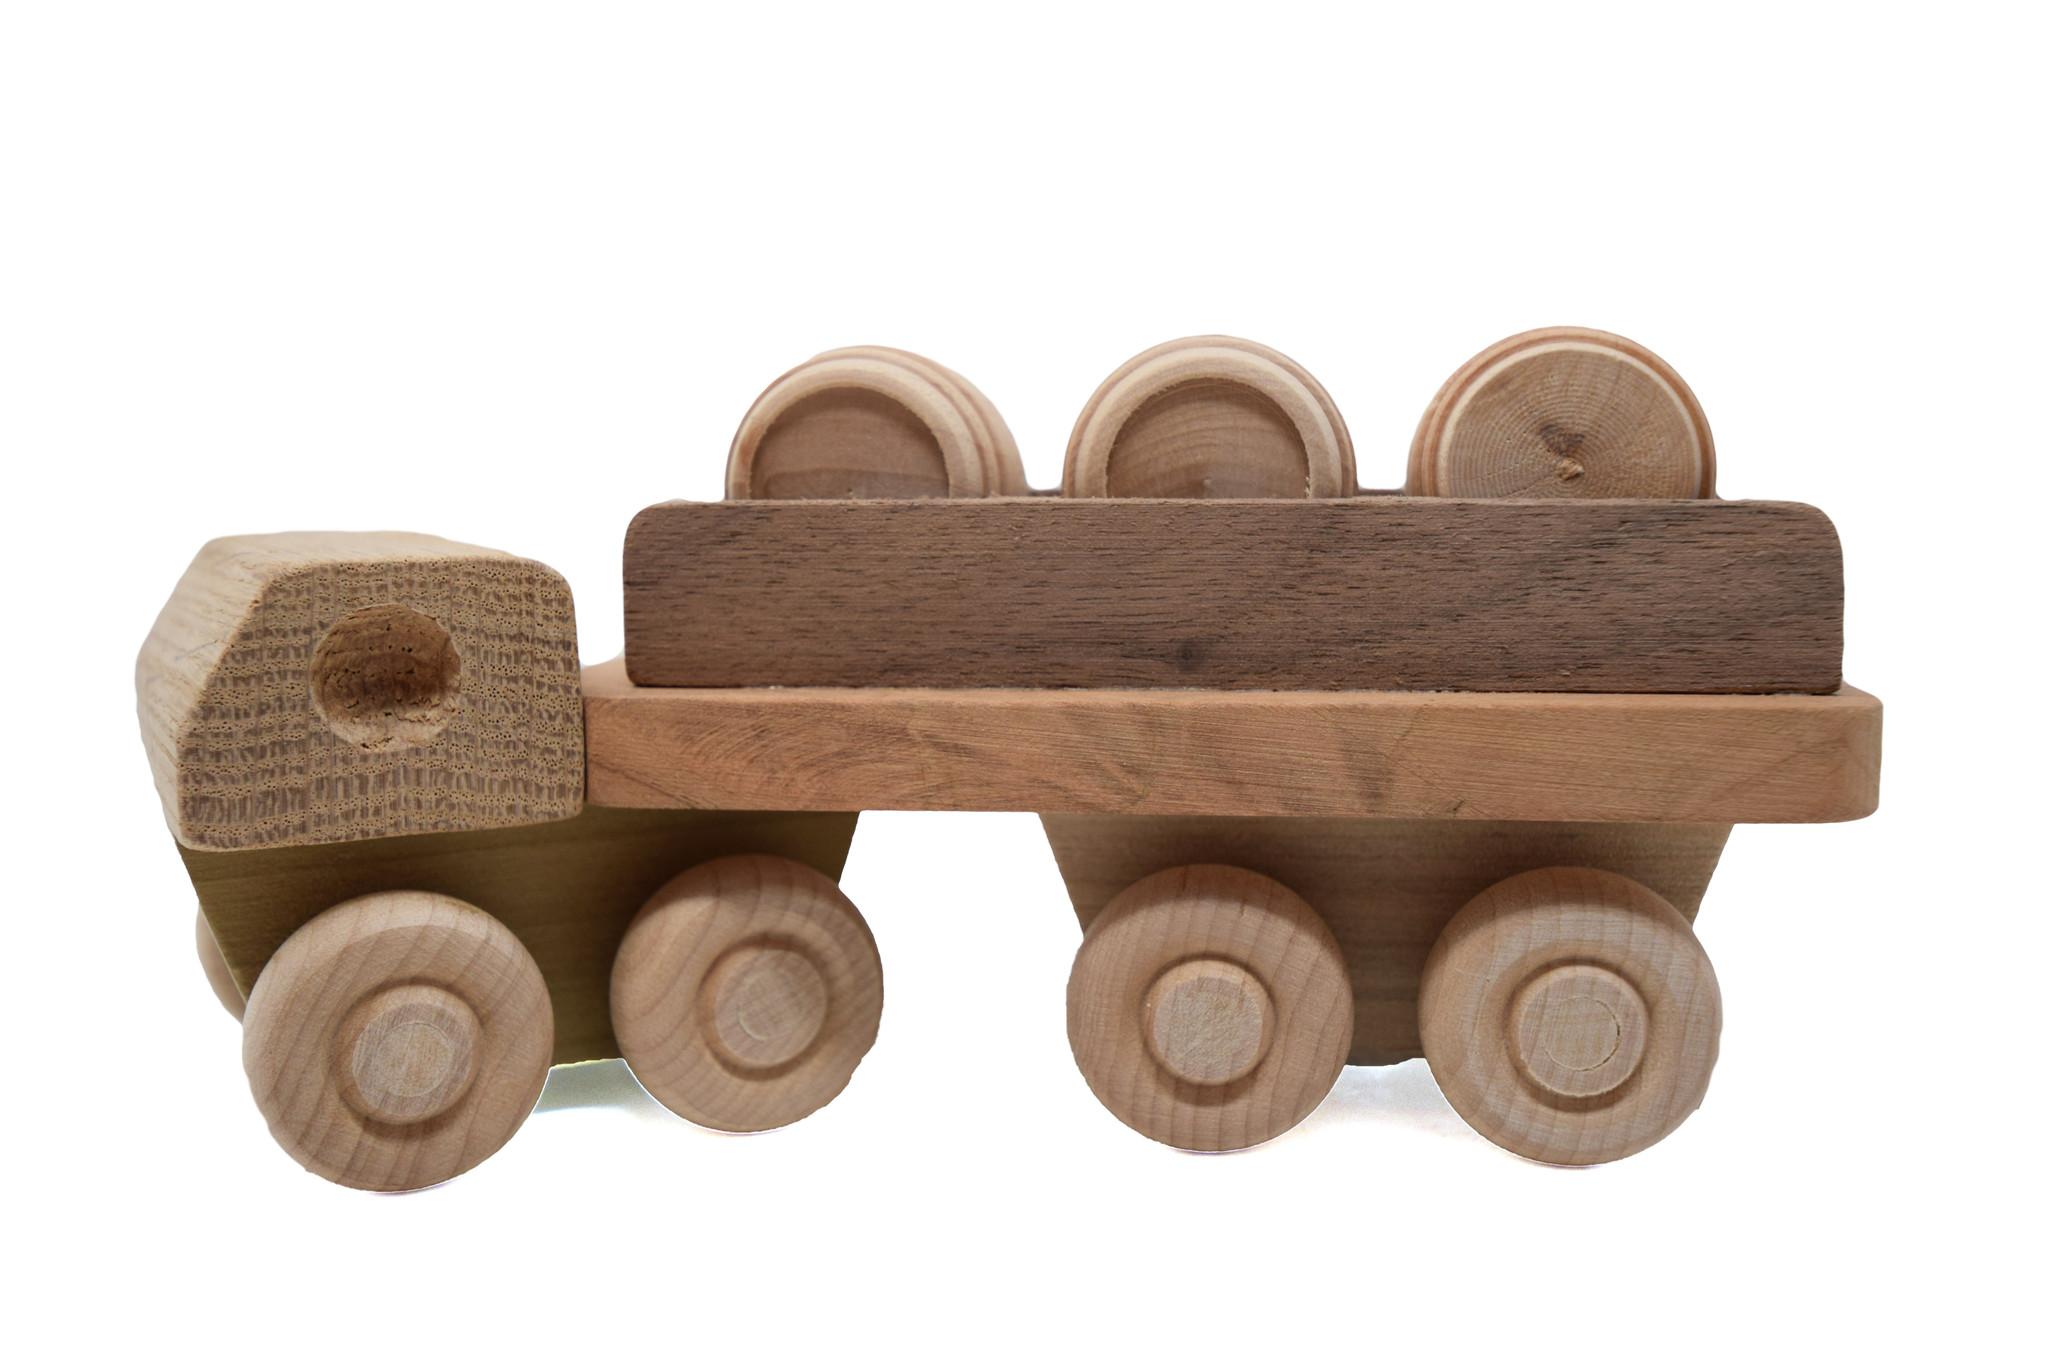 Wooden Barrel Truck Toy-2